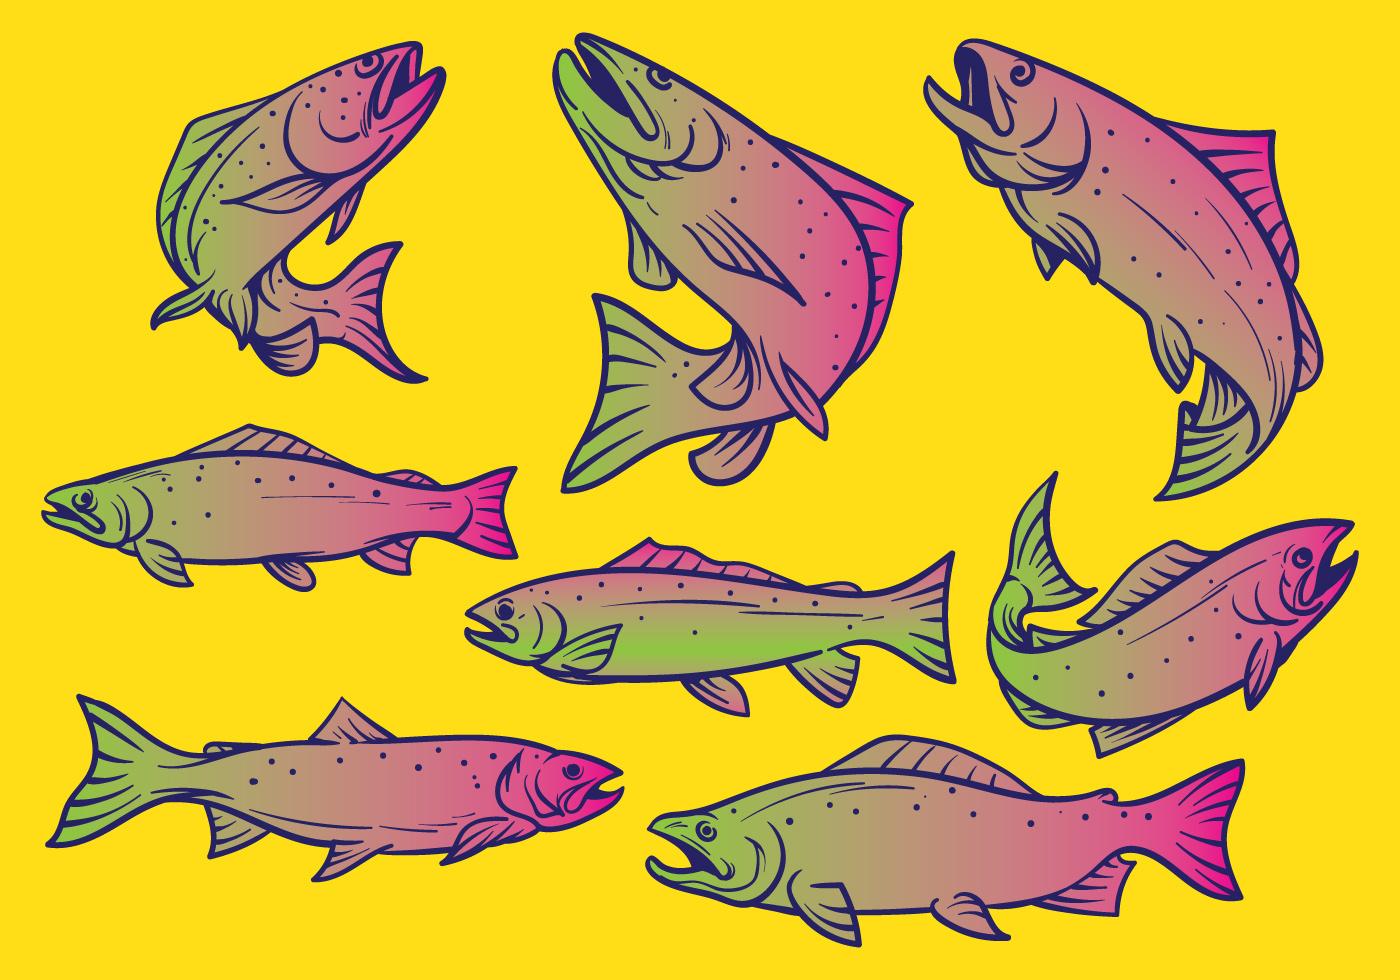 Fish Free Vector Art - (5131 Free Downloads)